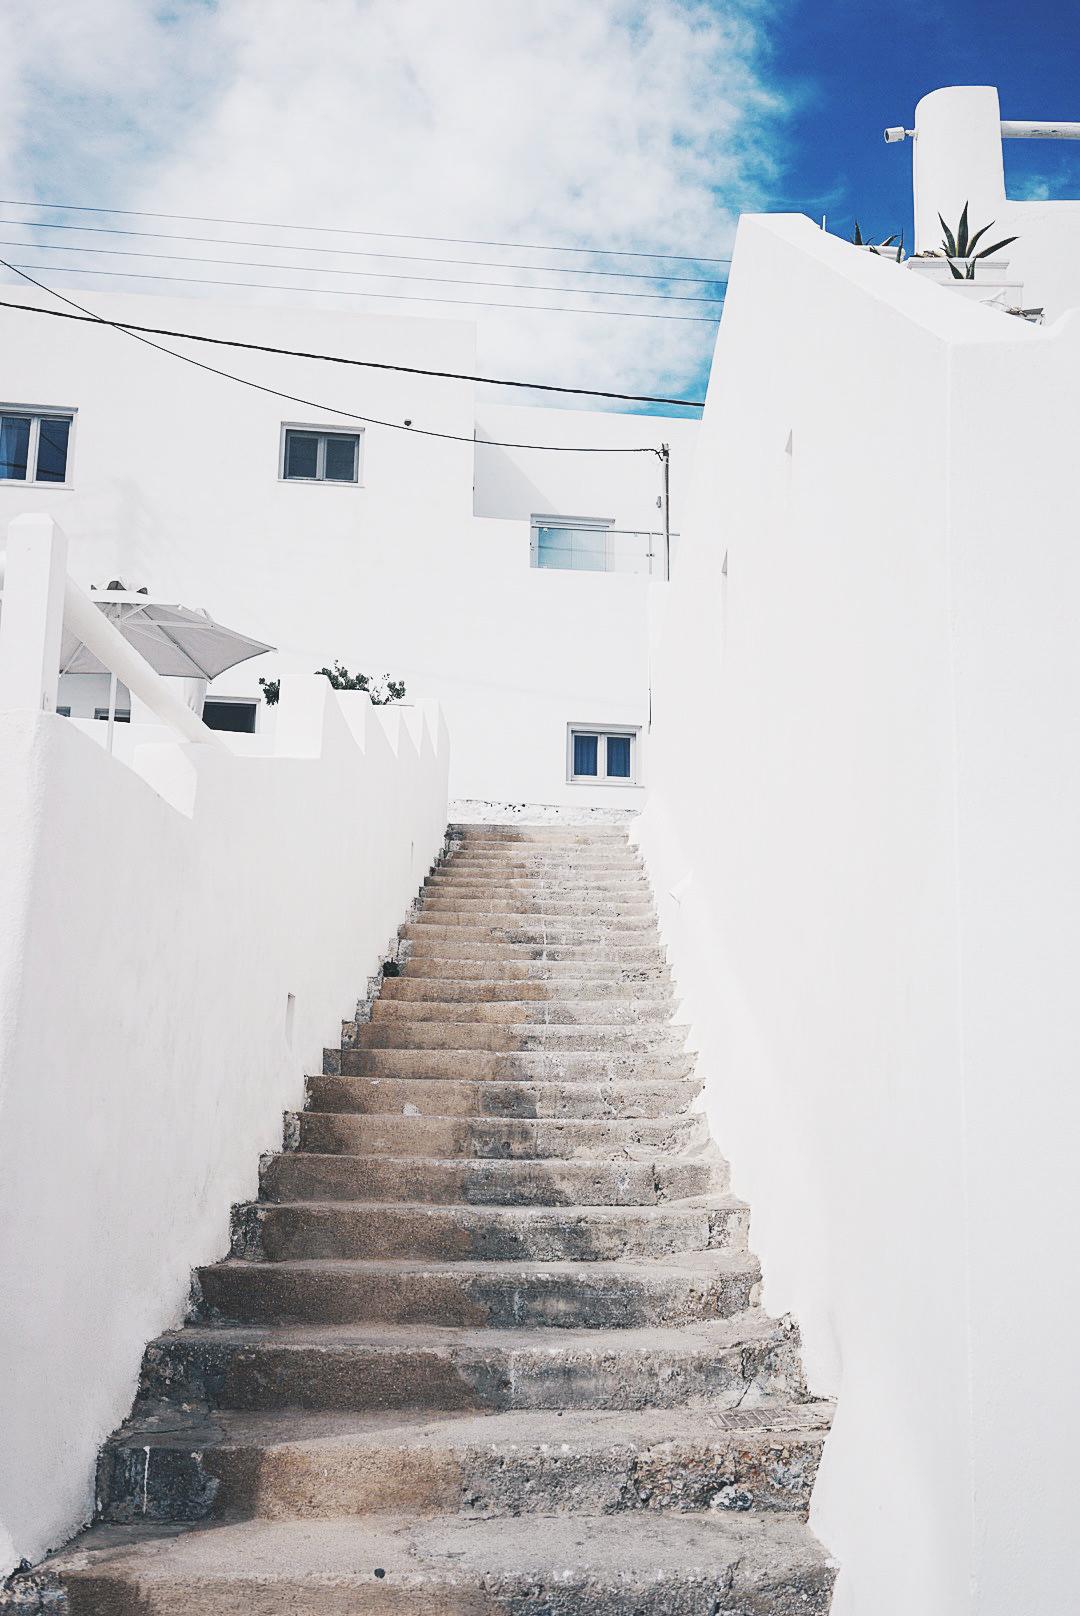 Blue_Dress-Soludos_Escapes-Soludos_Espadrilles-Canotier-Hat-Lack_Of_Color-Summer-Santorini-Collage_Vintage-146